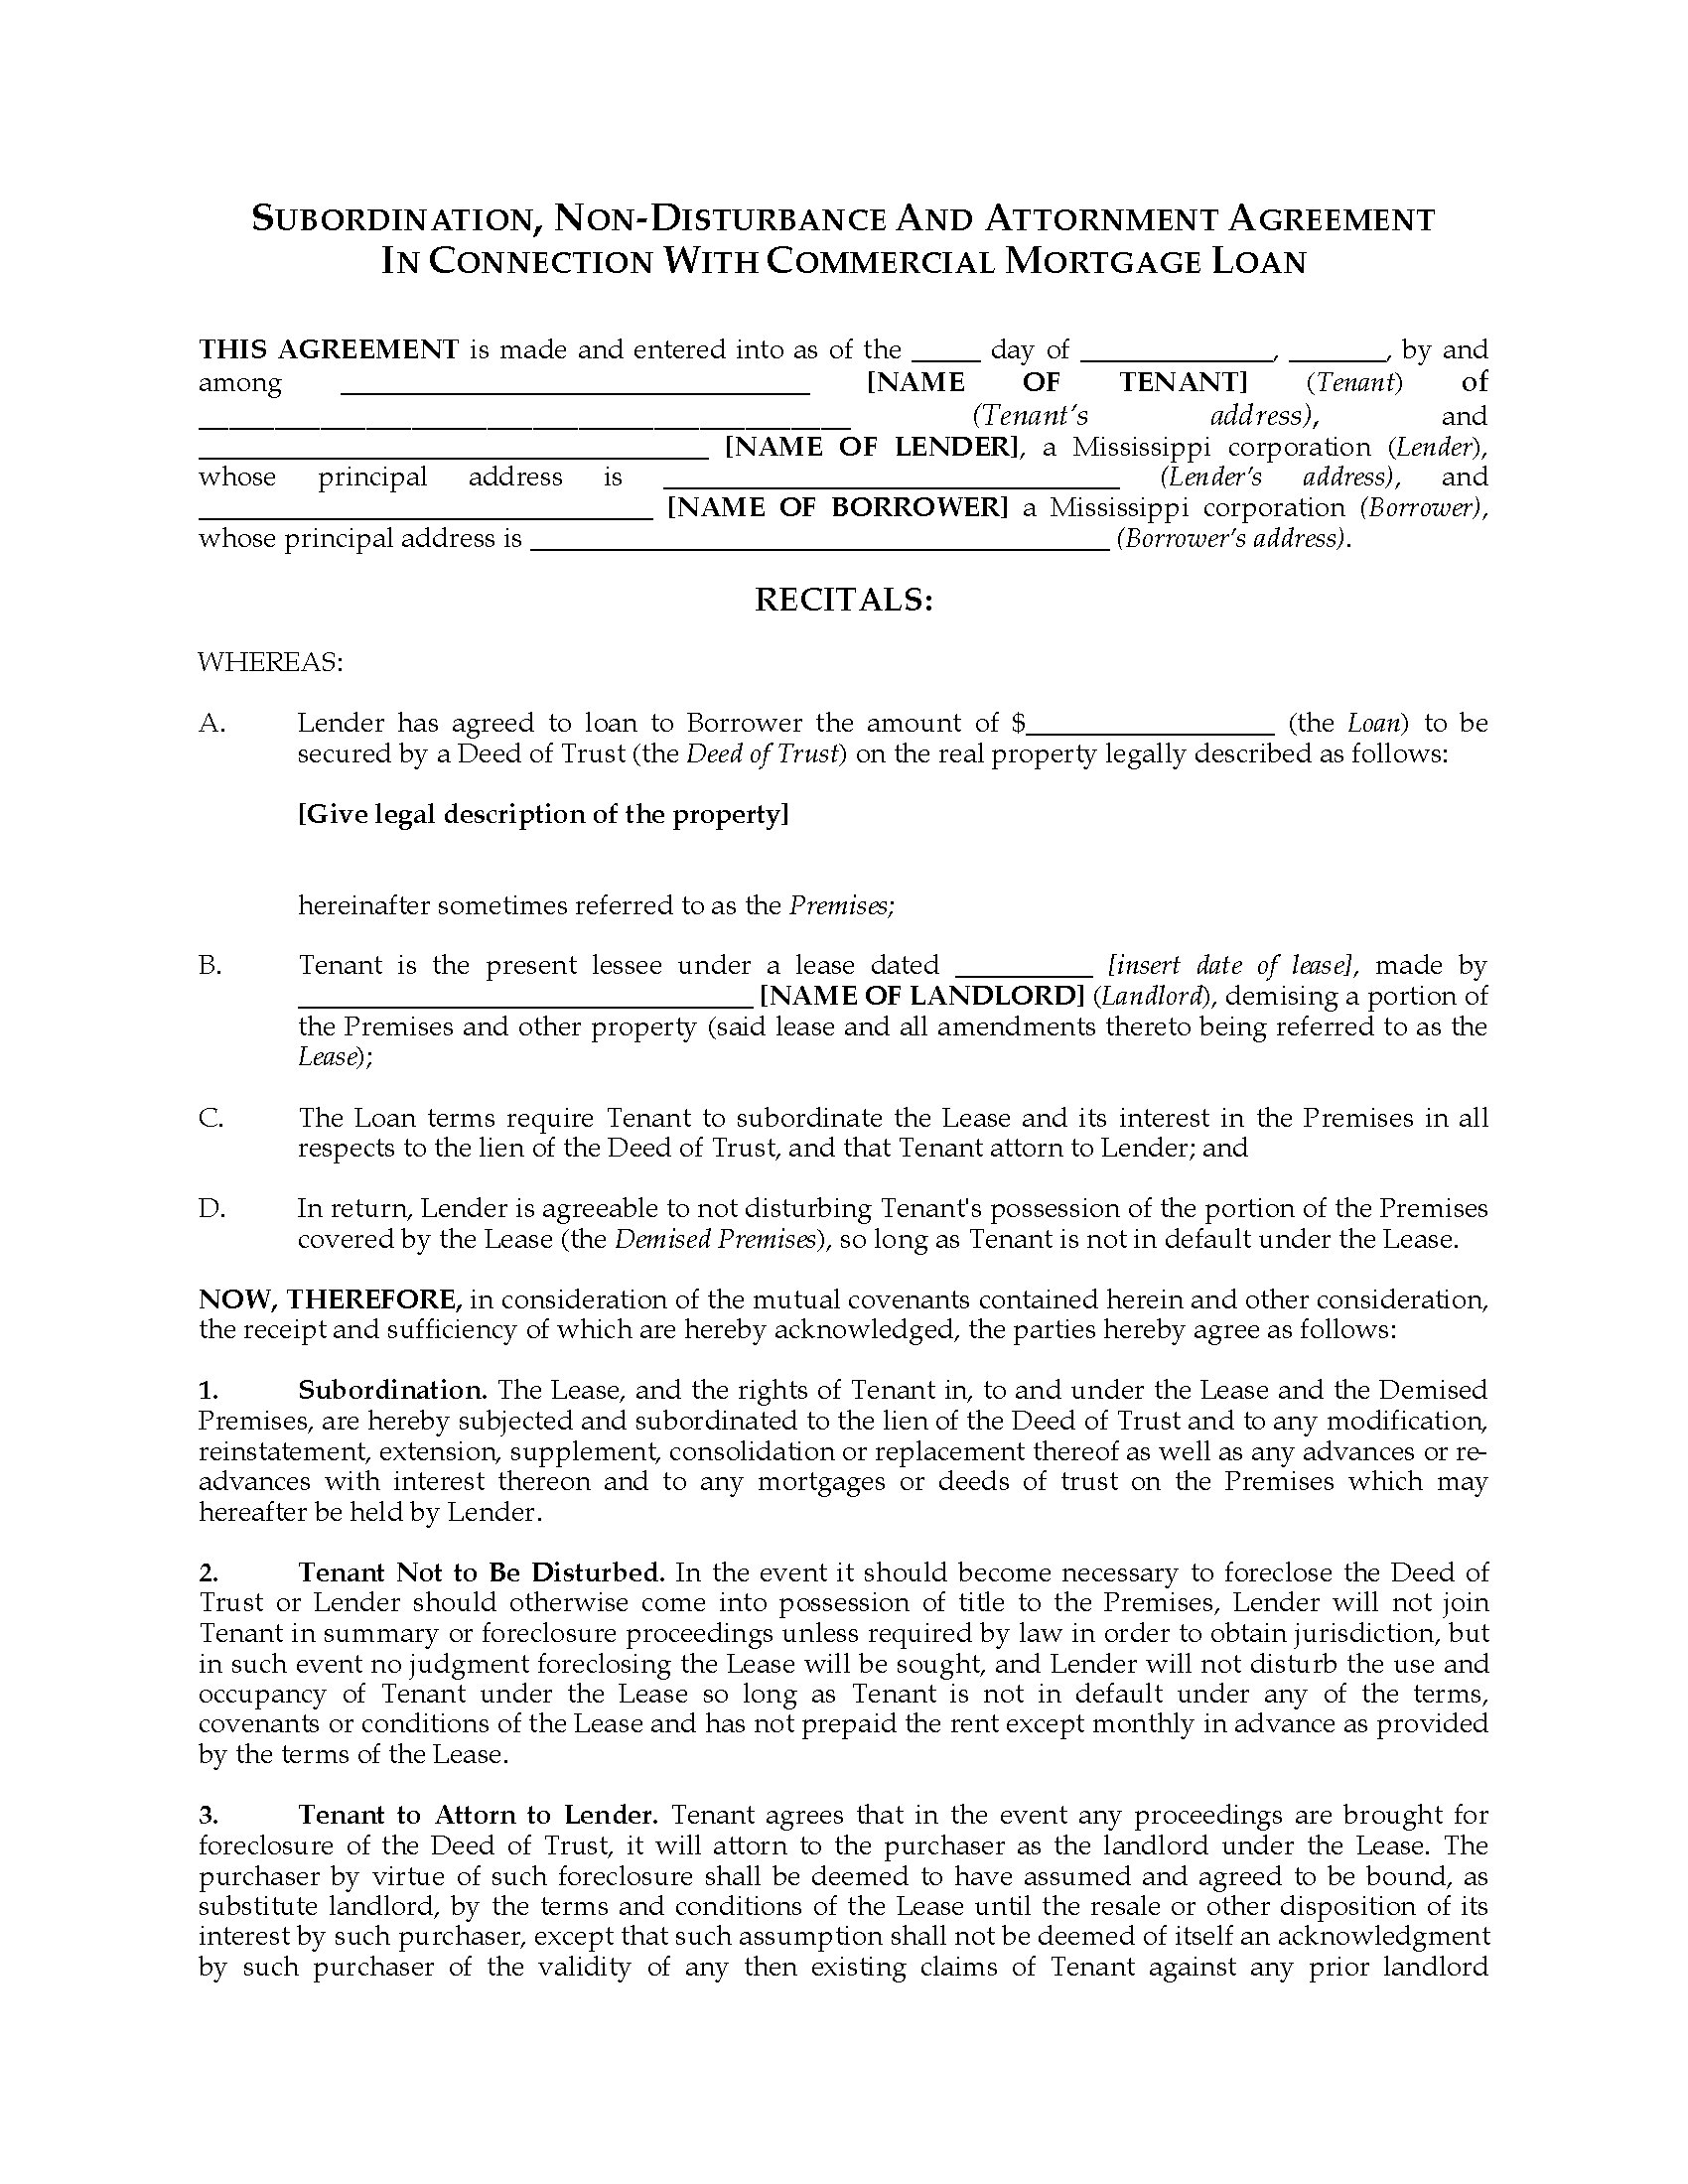 Multiattribute Evaluation (Quantitative Applications in the Social Sciences)